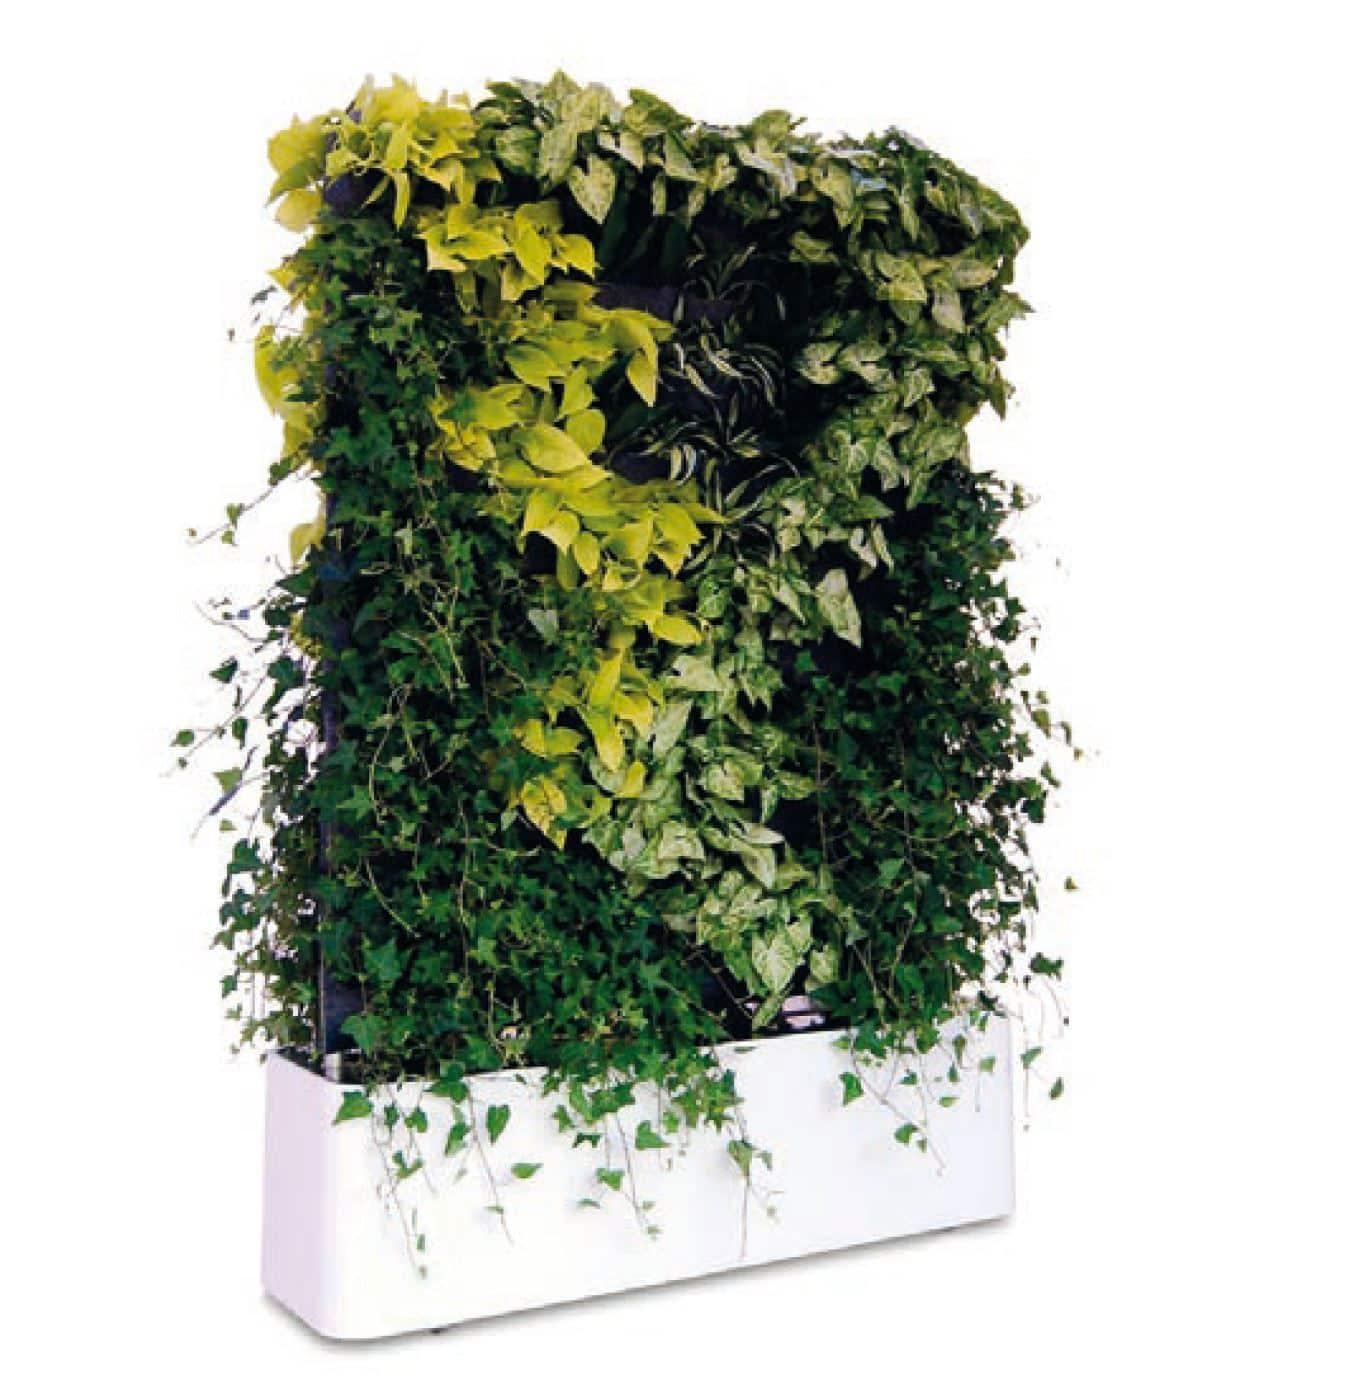 separador de planta viva